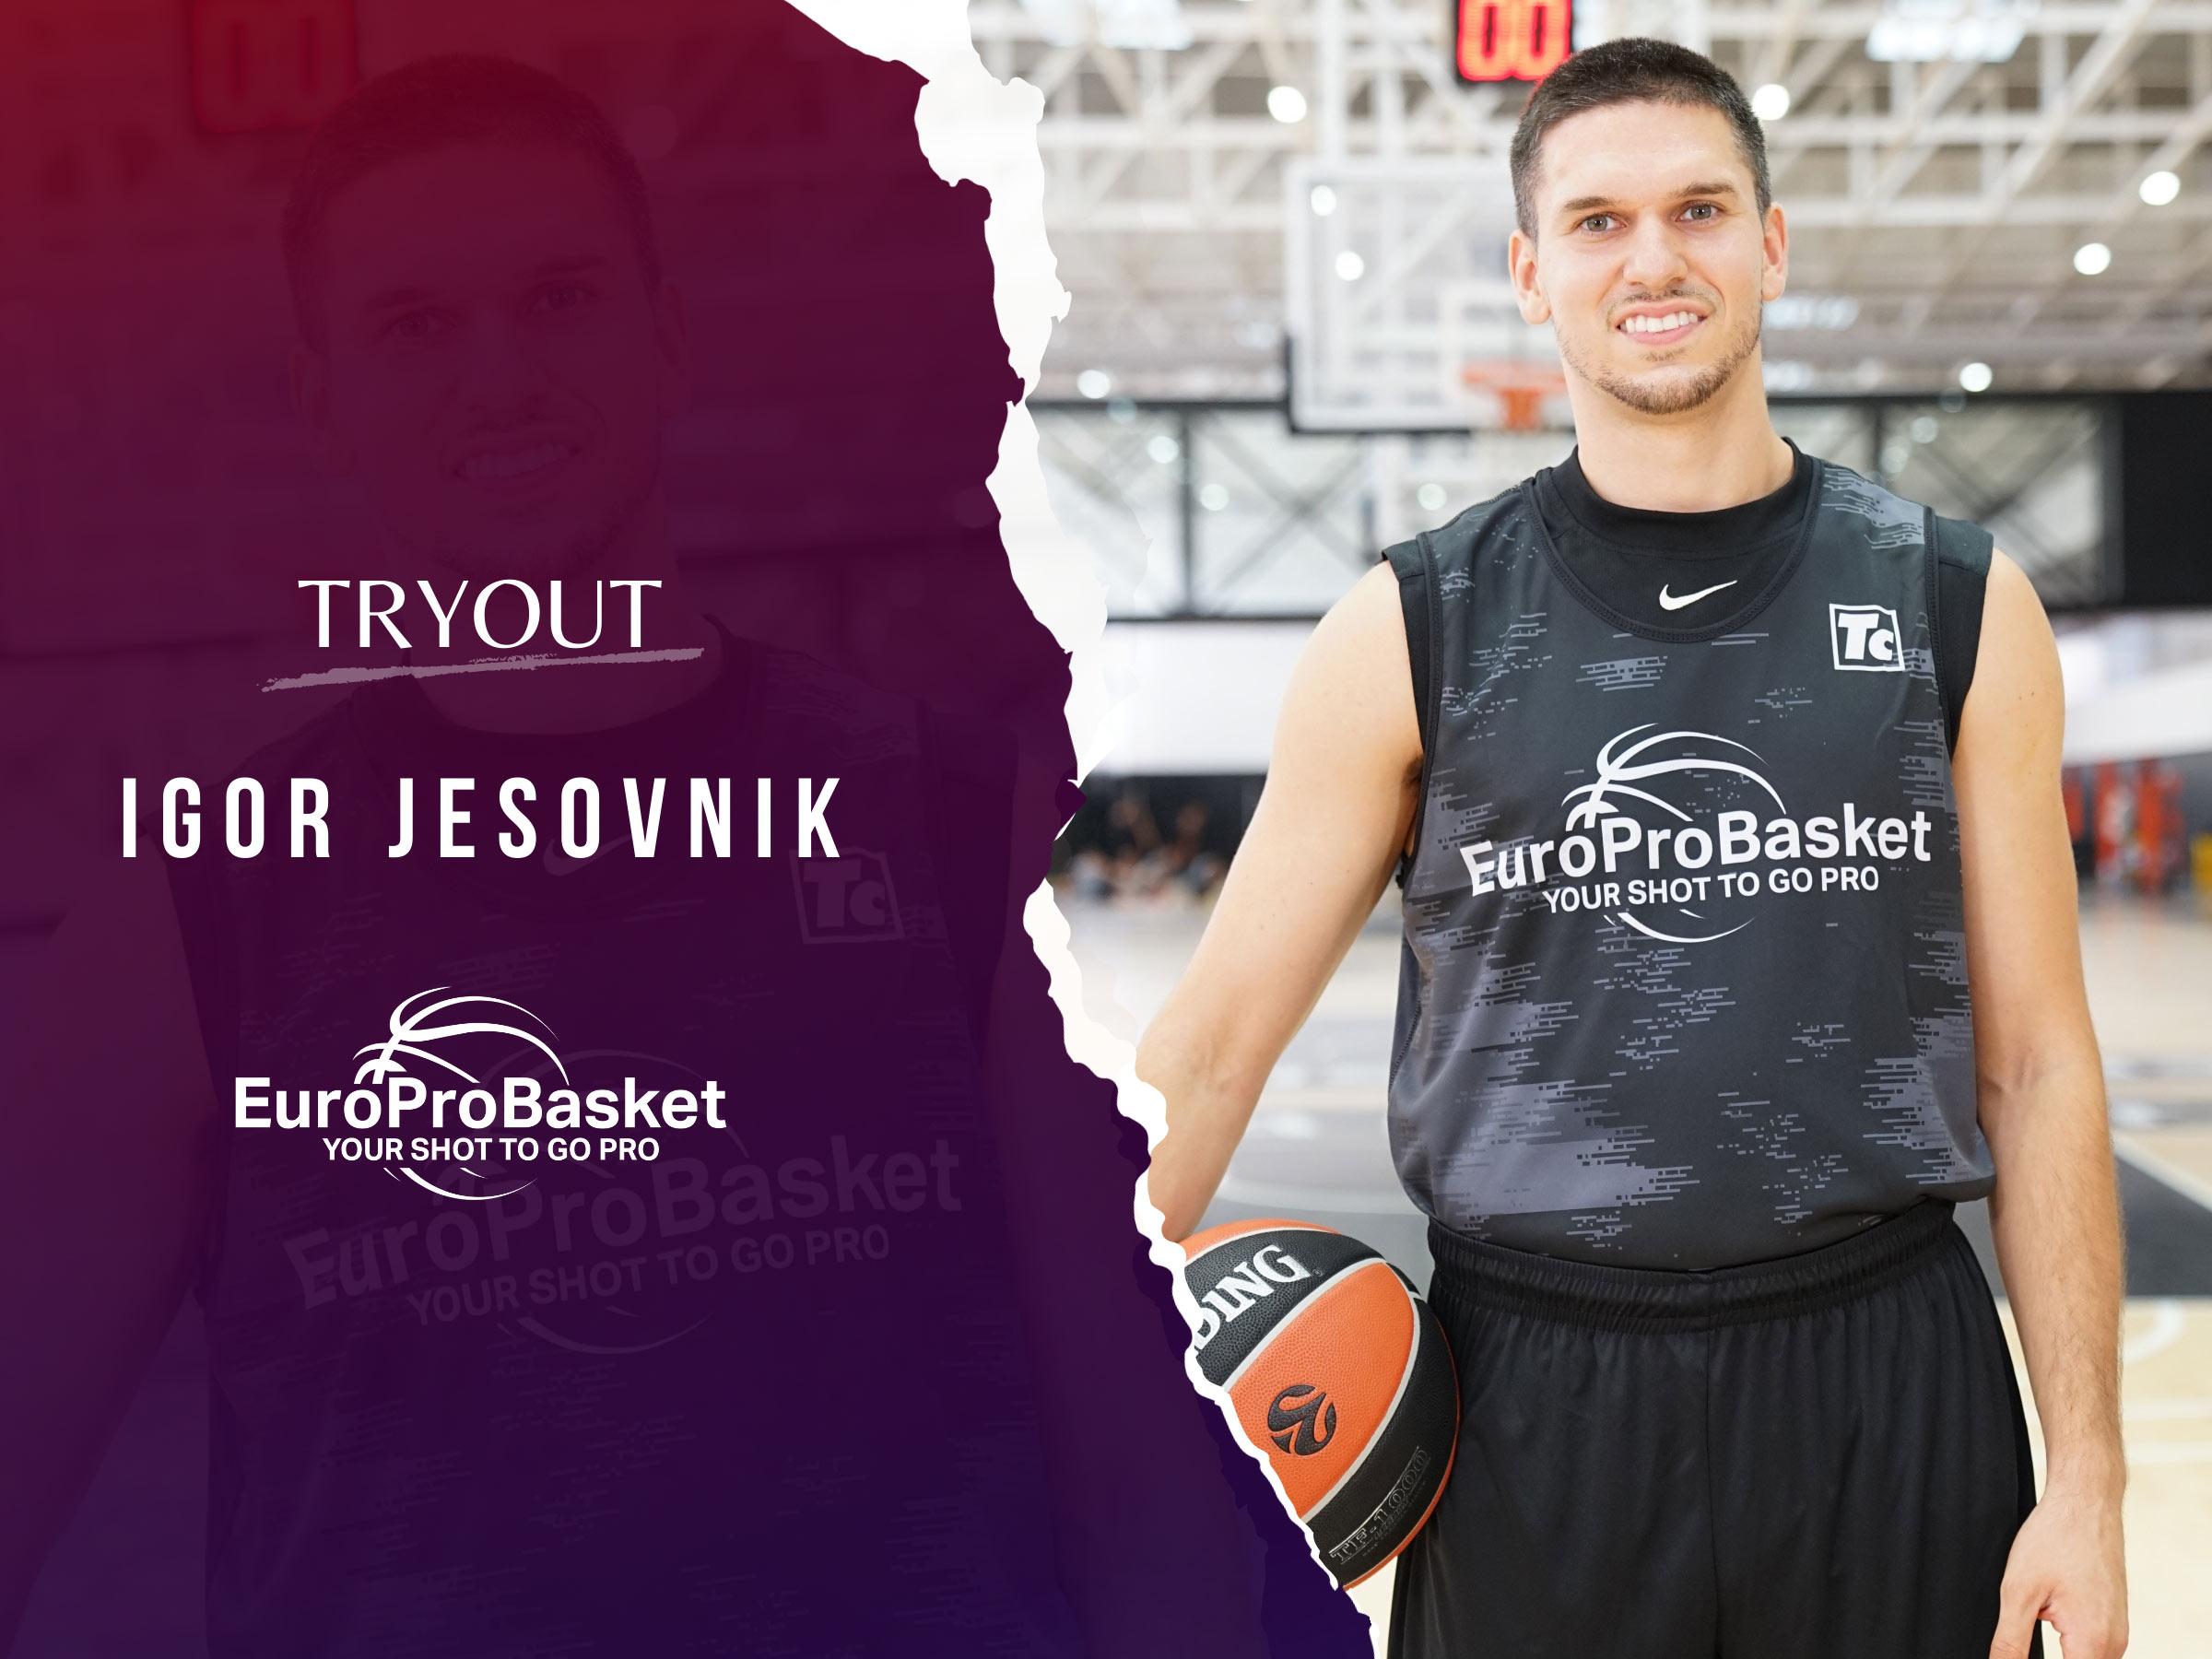 EuroProBasket Player Igor Jesovnik on Tryout in Xativa, Spain